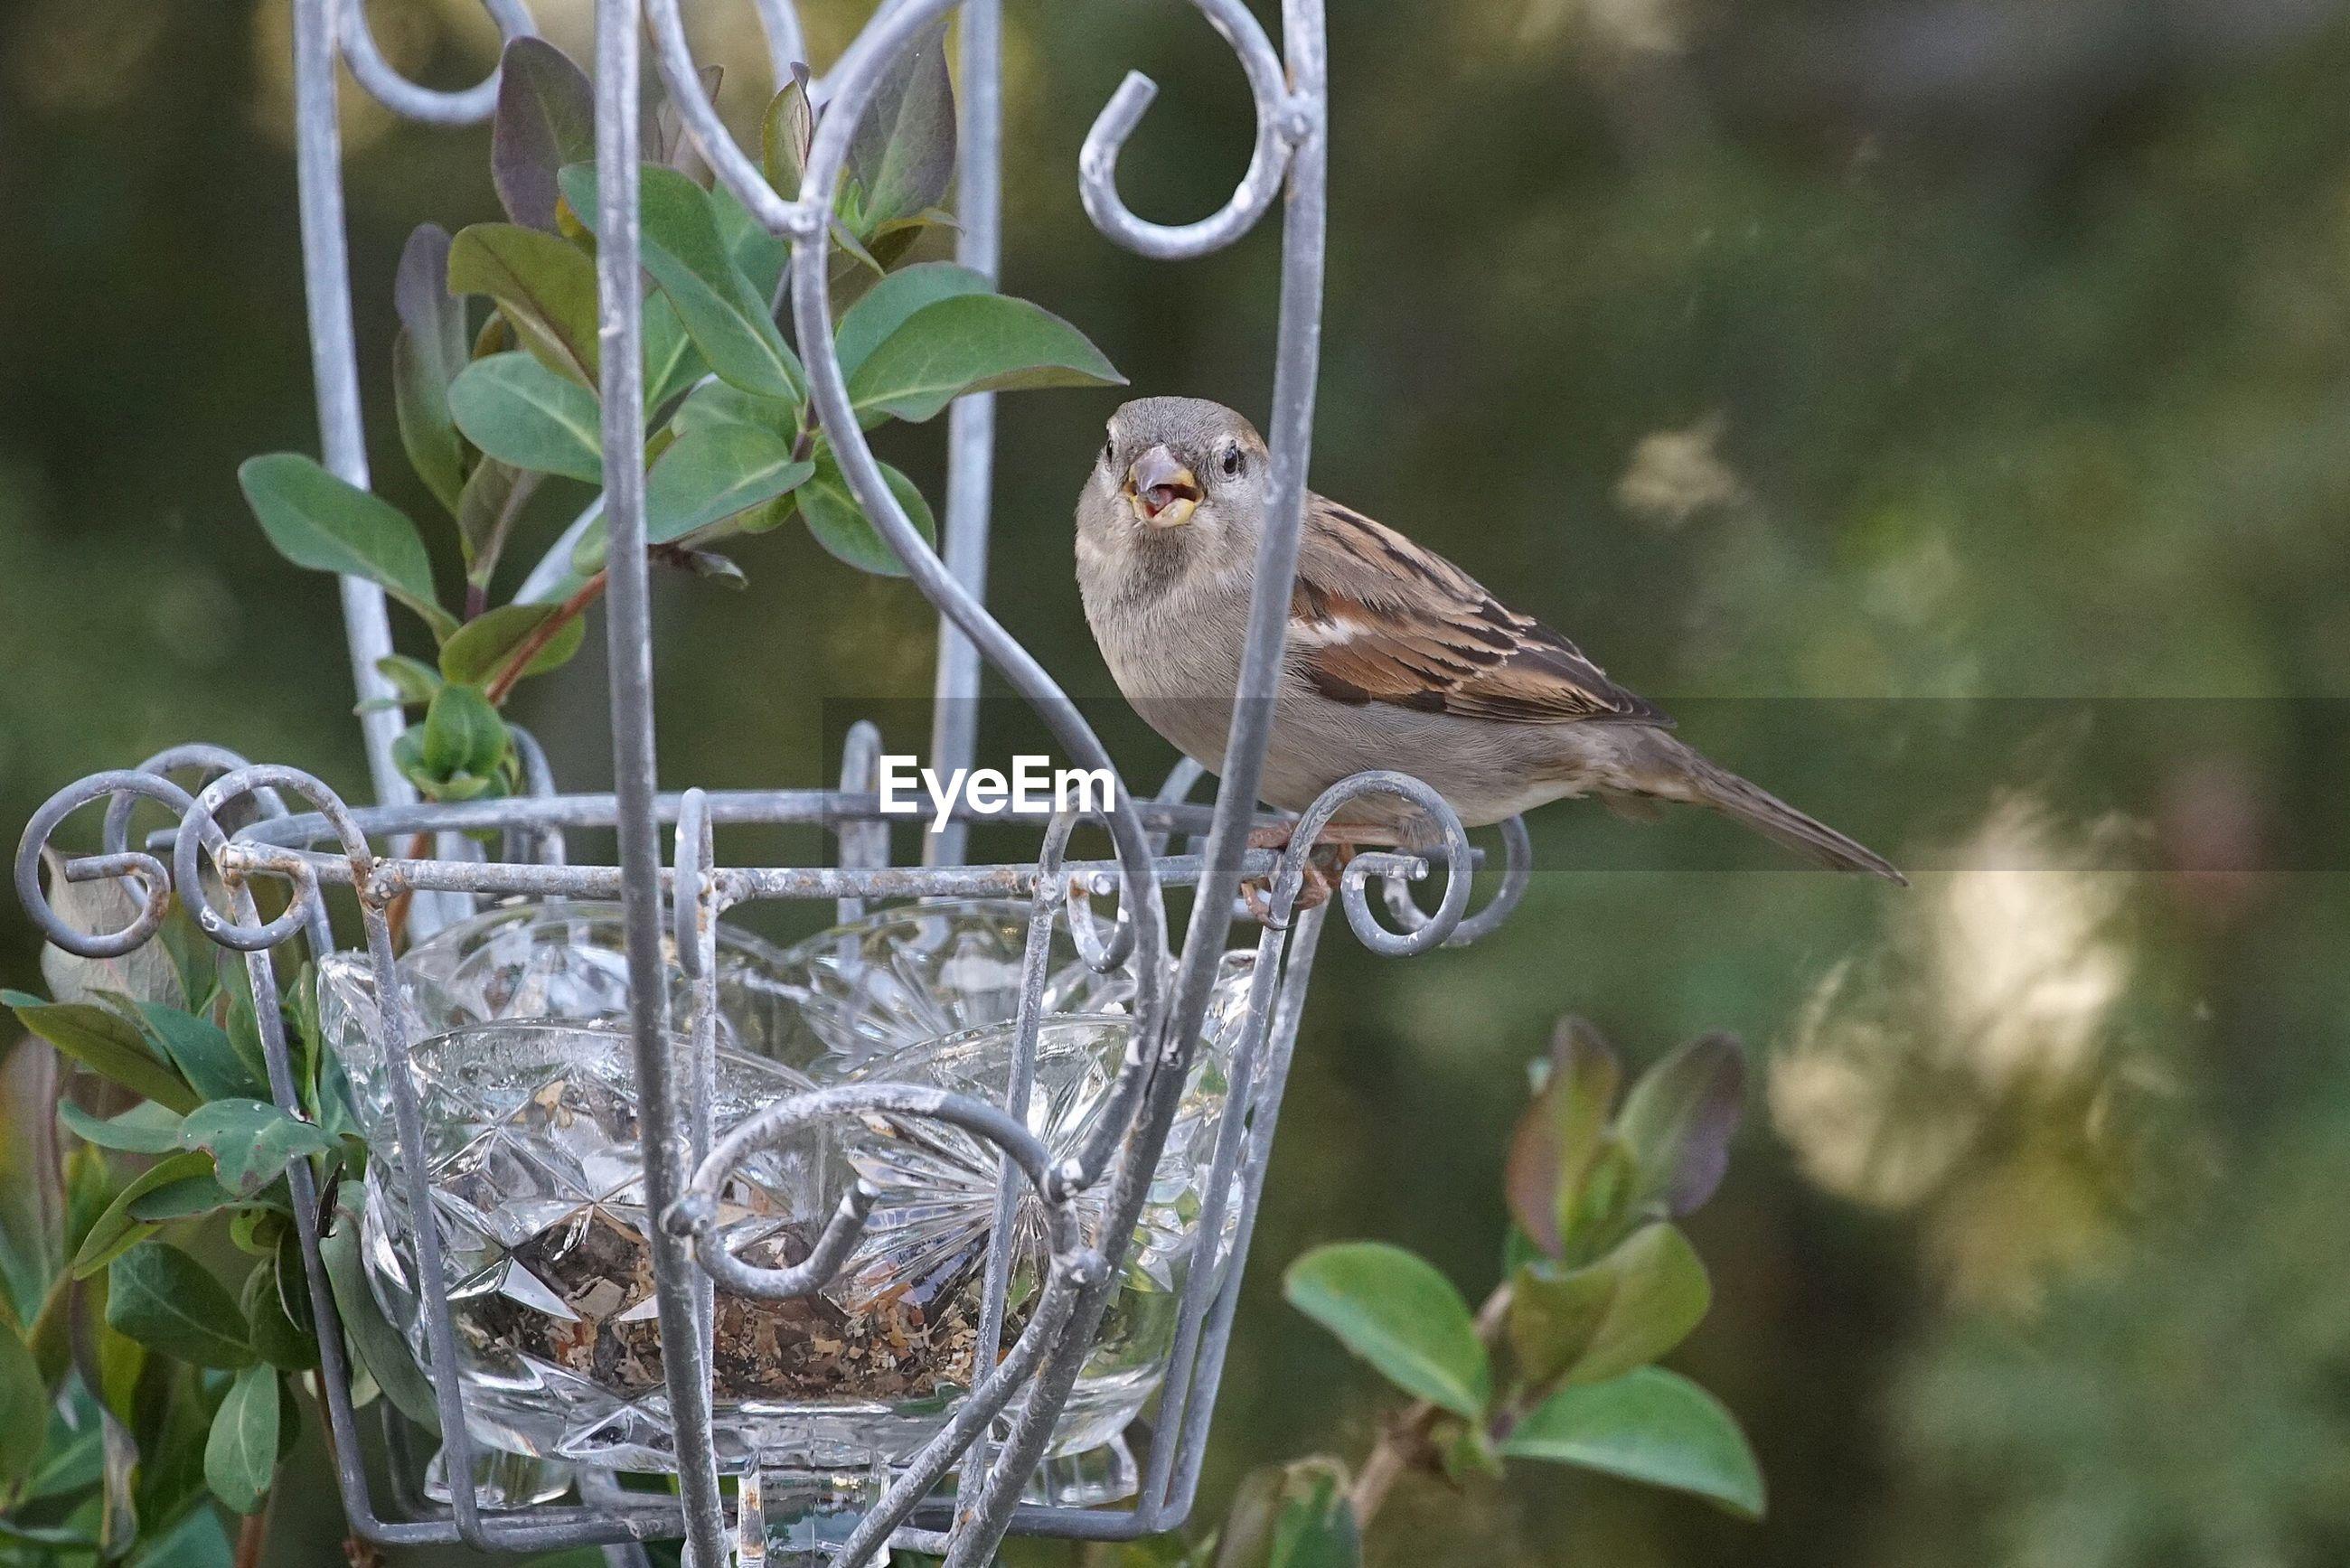 Sparrow perching on bird feeder